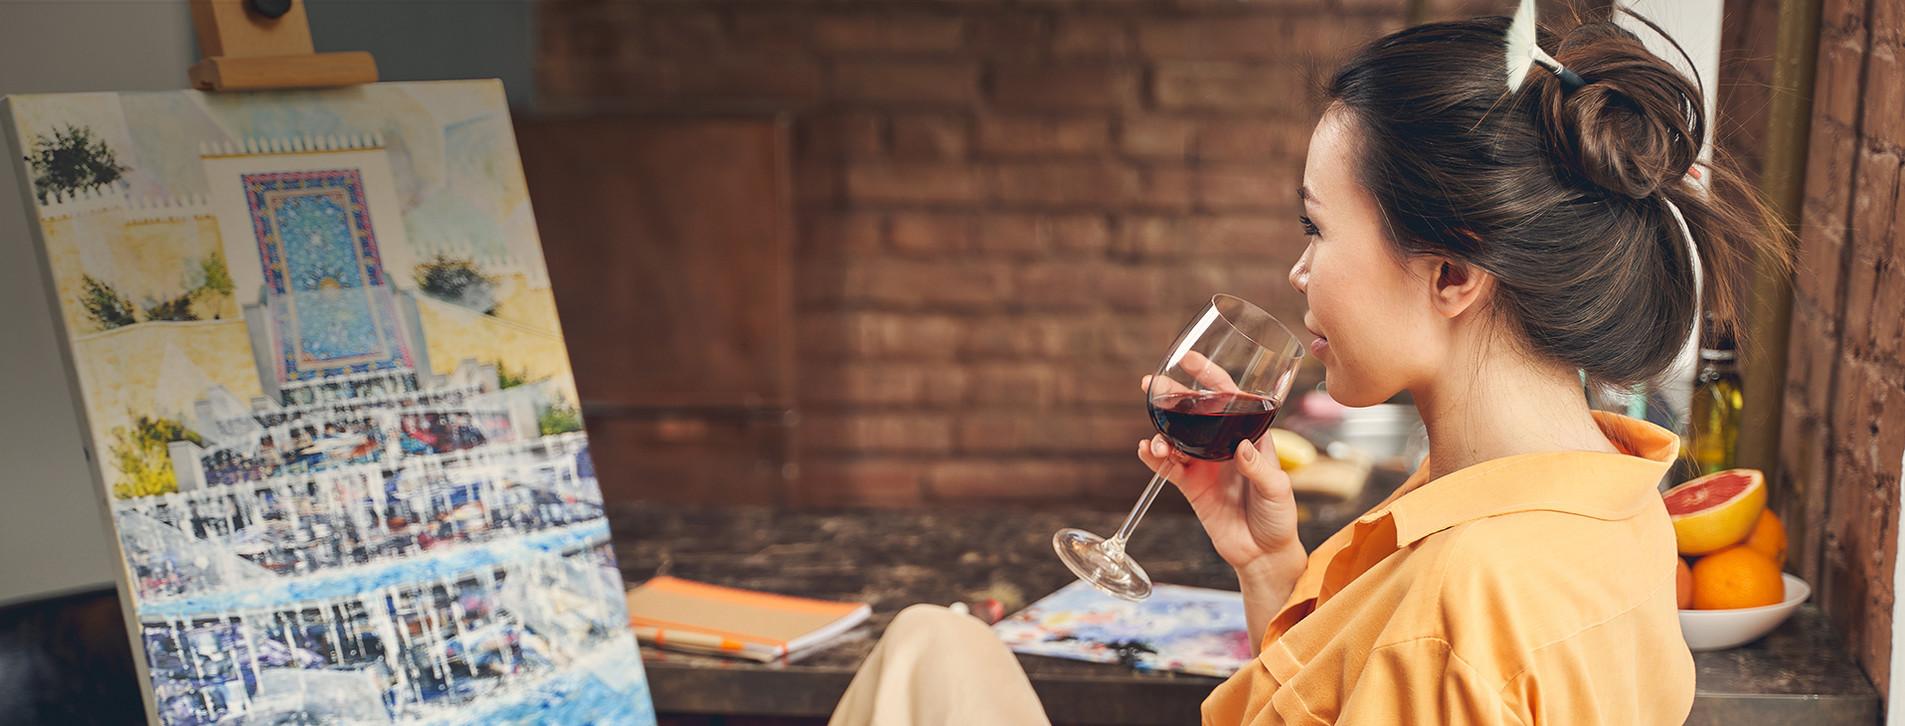 Фото 1 - Живопись и вино для компании